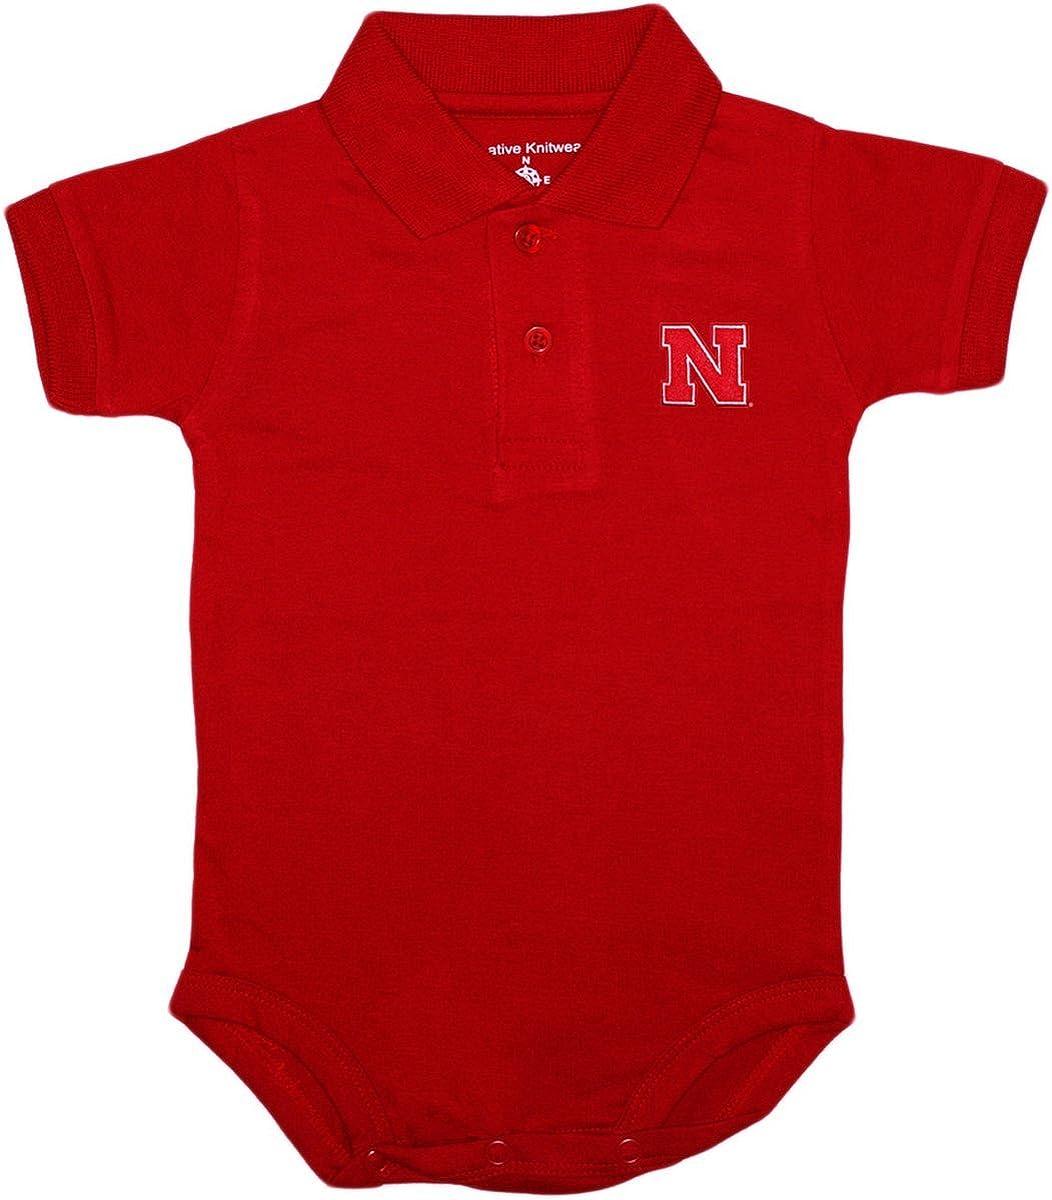 Creative Knitwear University of Nebraska Cornhuskers Striped Baby Bodysuit